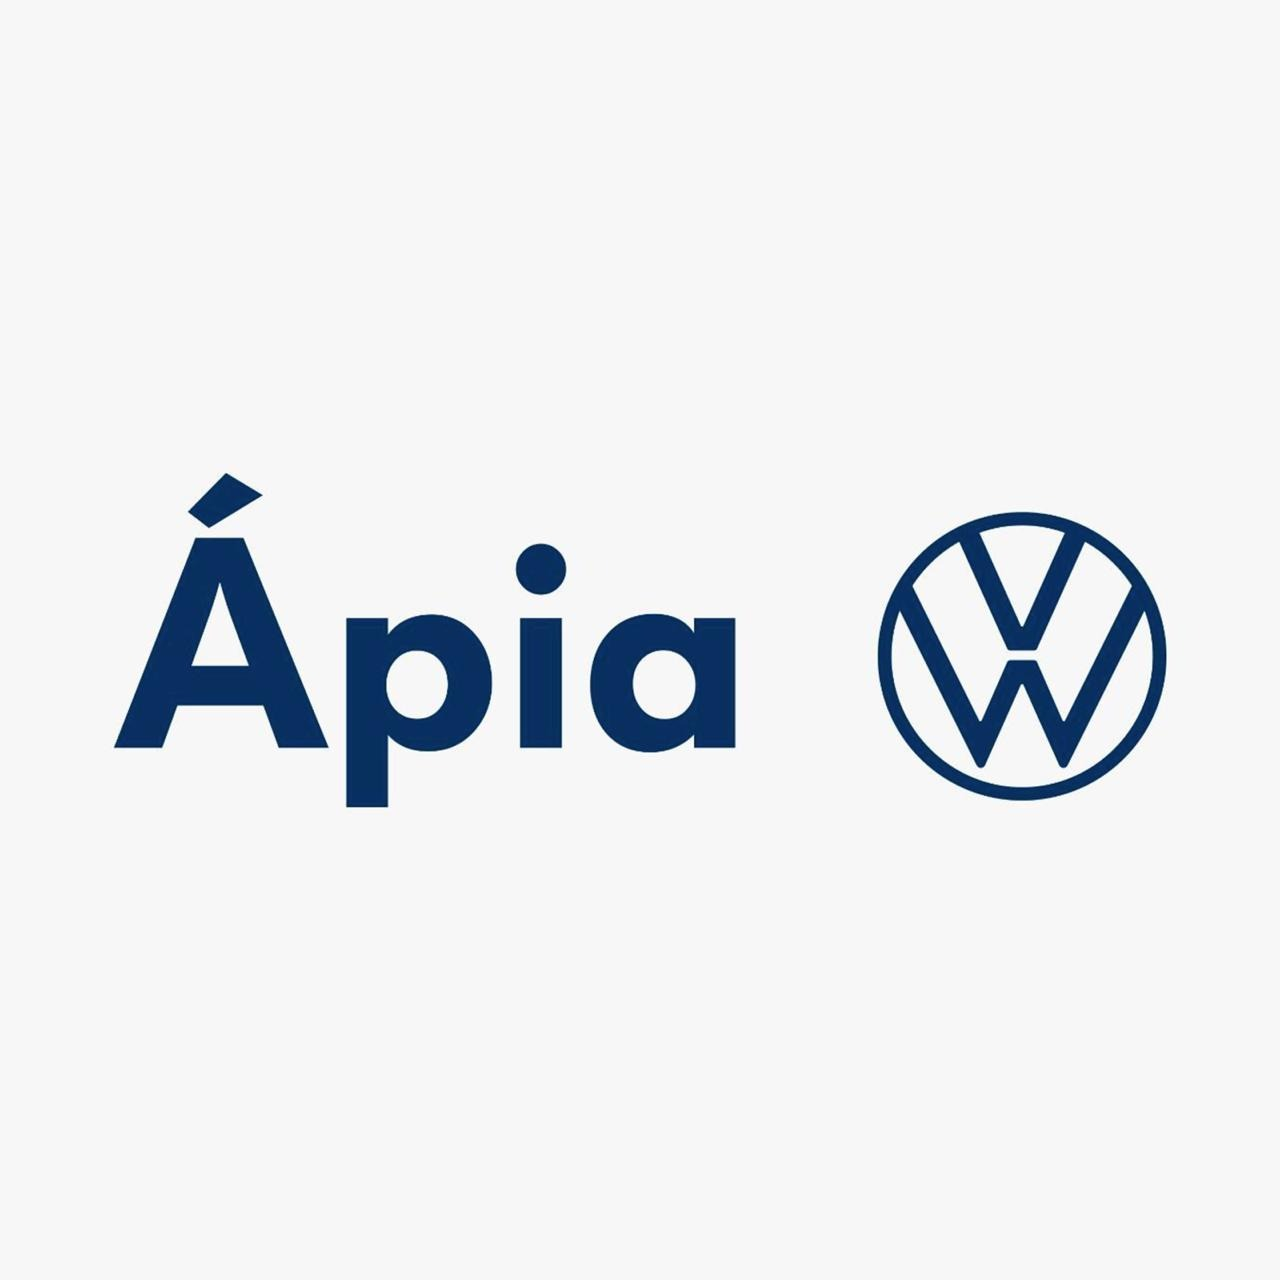 Atendimento Web Ápia (apiavendasweb) Profile Image | Linktree